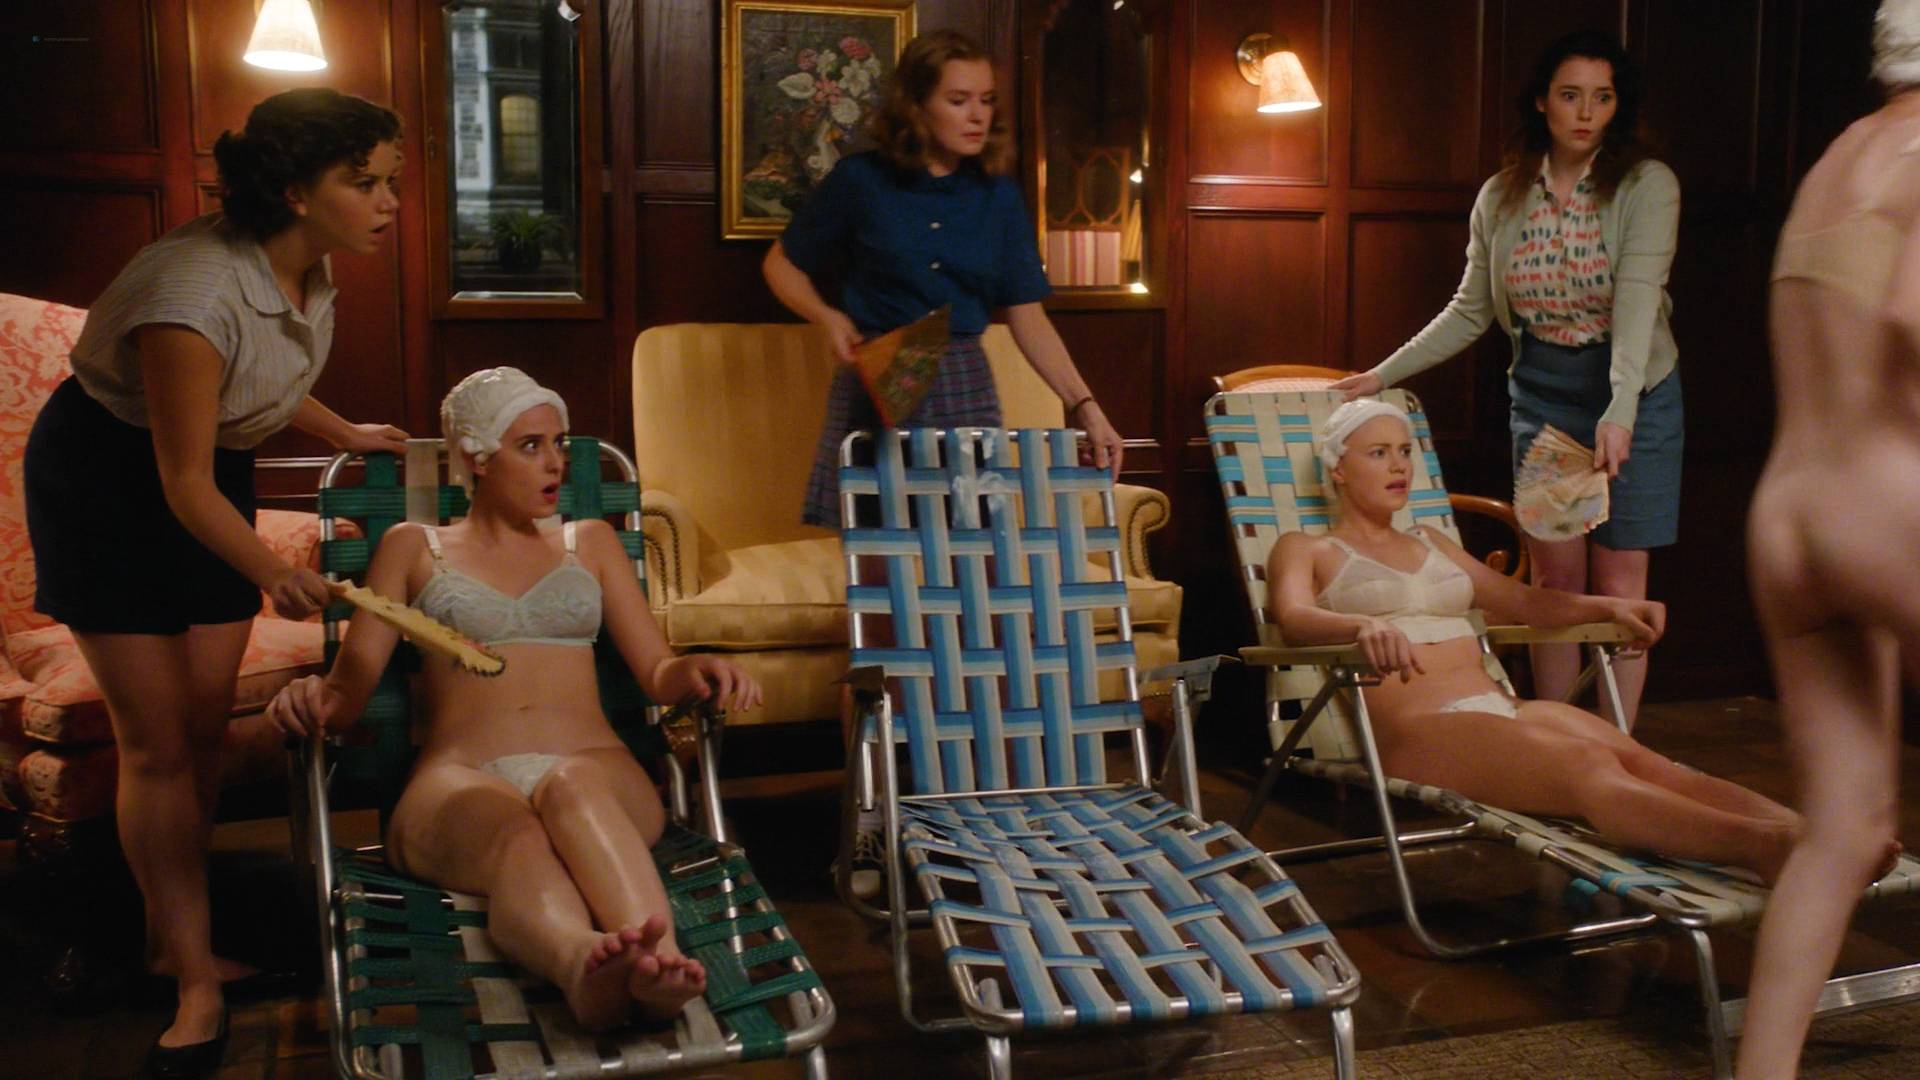 Rachel-Brosnahan-nude-topless-and-butt-Kyla-Walker-hot-The-Marvelous-Mrs-Maisel-2017-s1e1-HD-1080p-00003.jpg